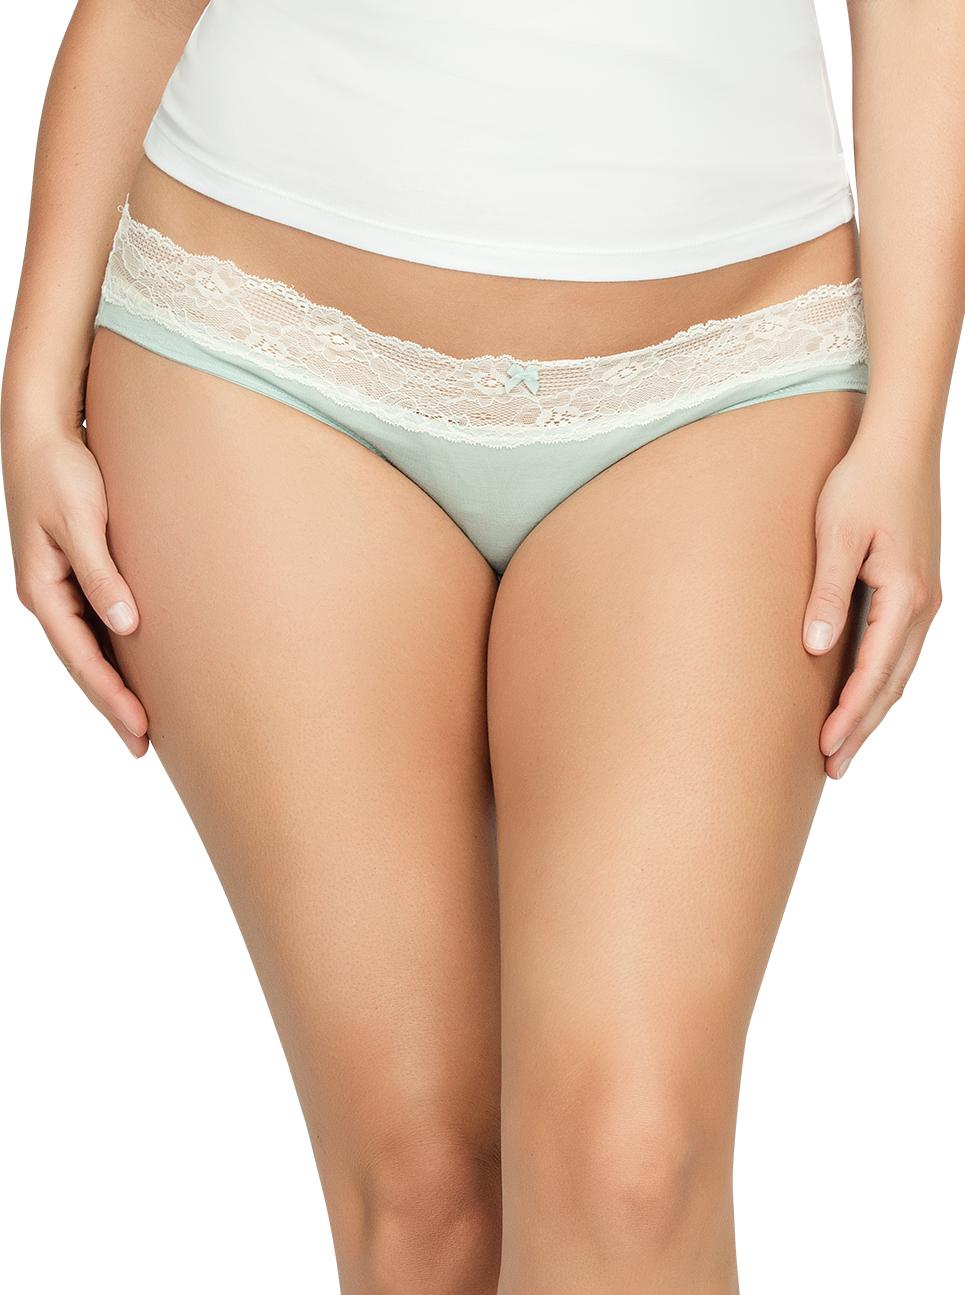 ParfaitPanty SoEssential BikiniPP303 Surf Front - Panty So Essential Bikini- Surf - PP303